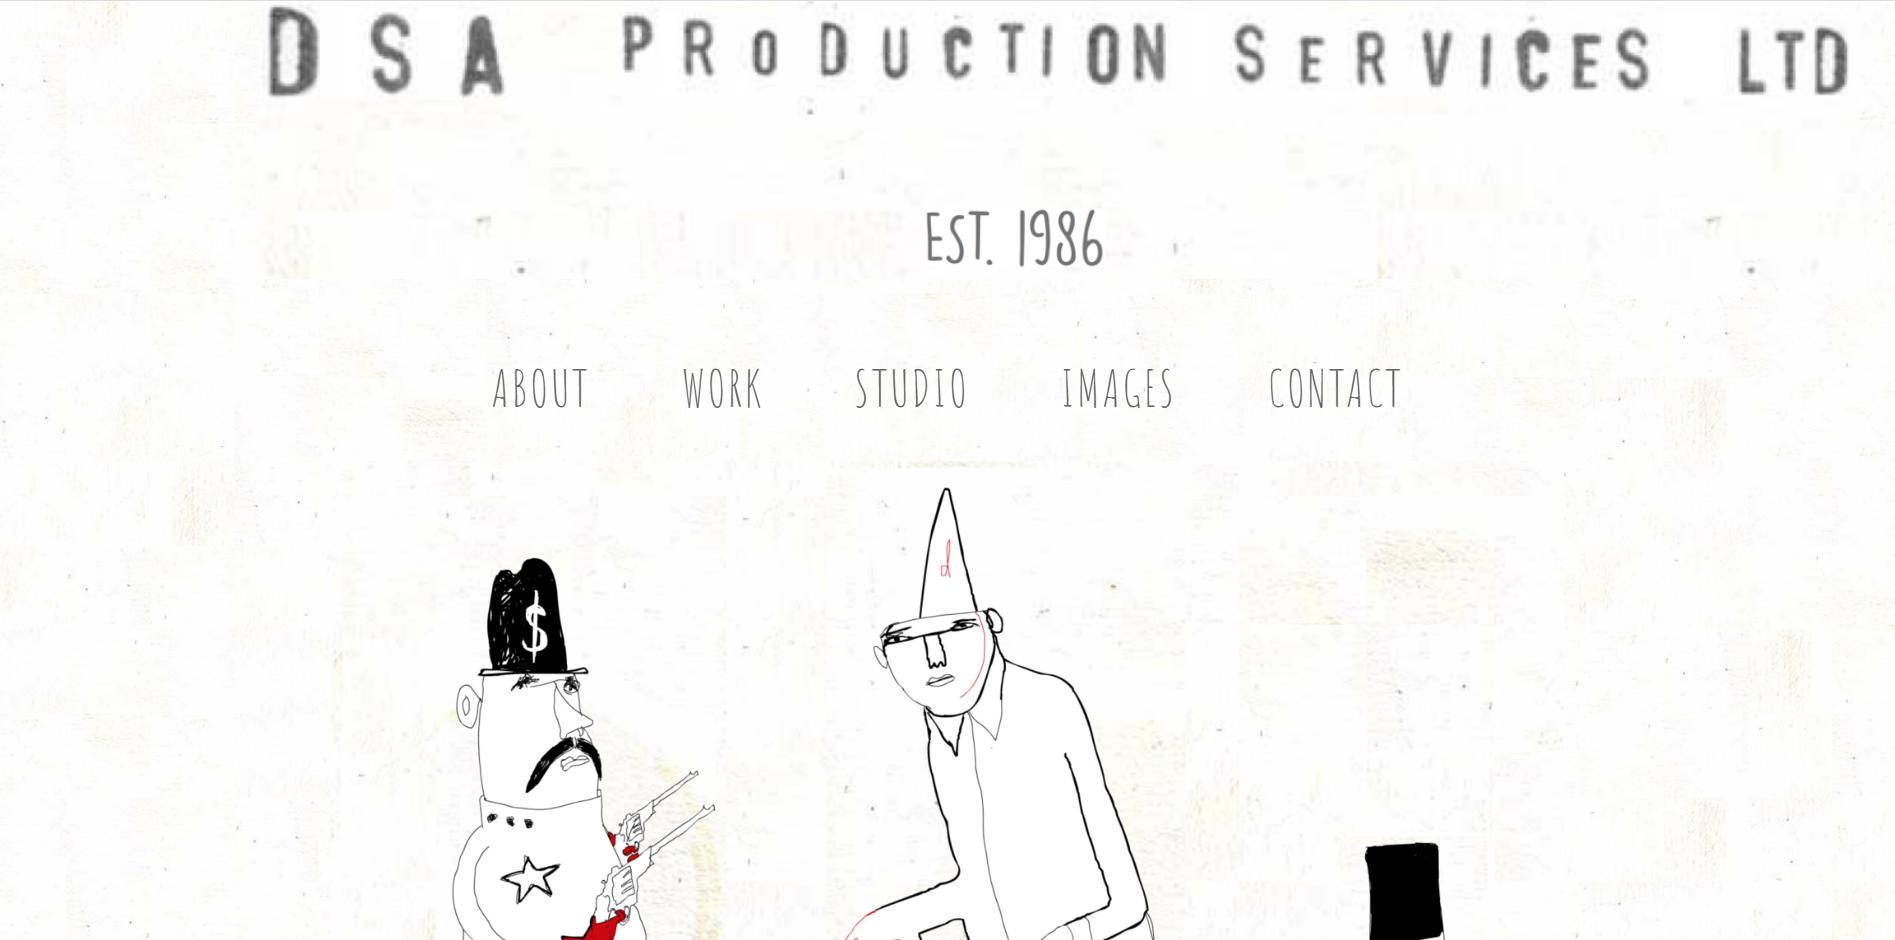 DSA Productions